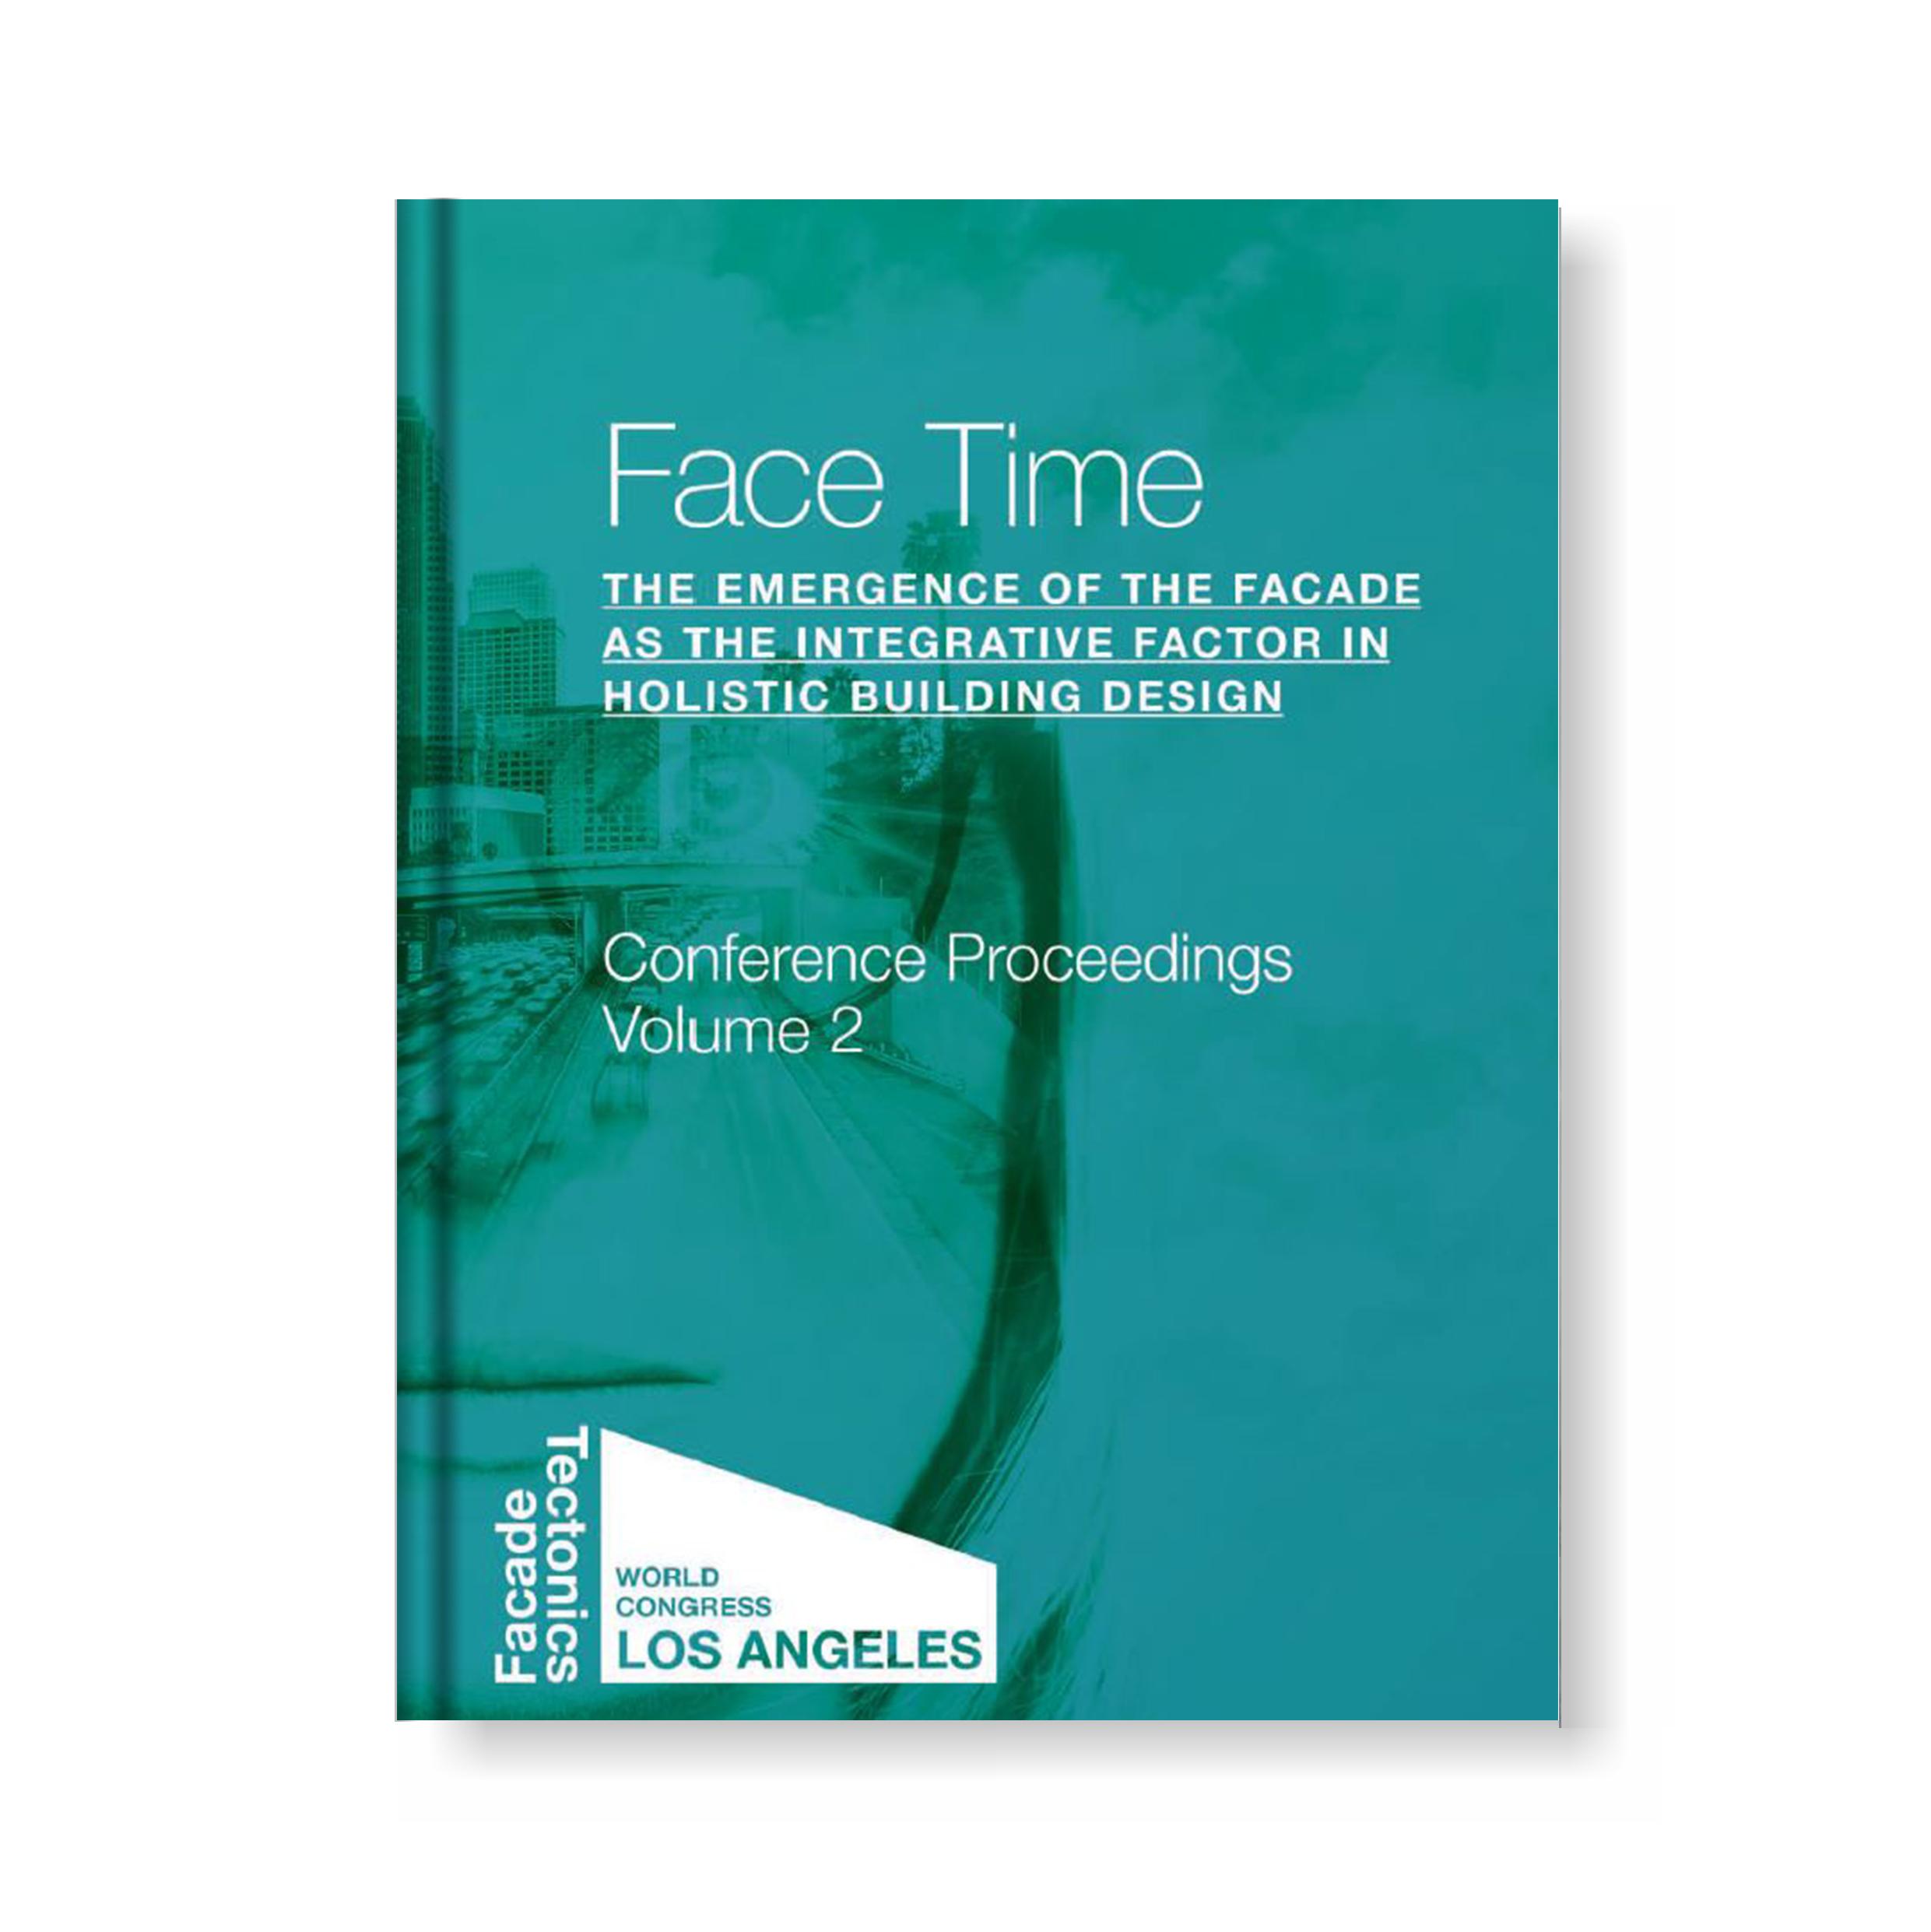 FACADE TECTONICS – World Congress Los Angeles 2016 – Conference Proceedings – Volume 2